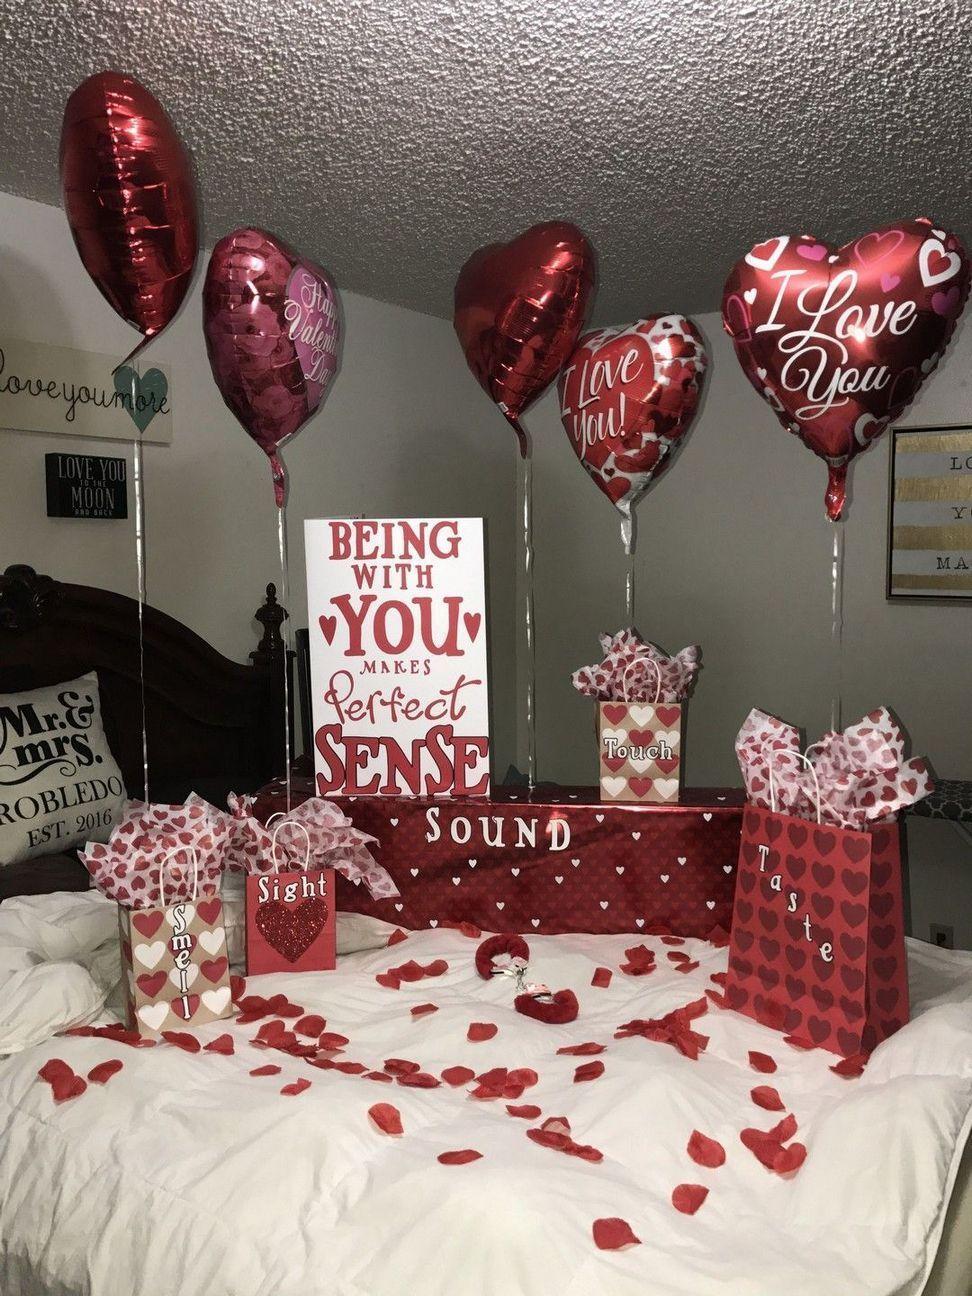 Stunning Diy Romantic Valentine Days Decorations Ideas 34 Diy